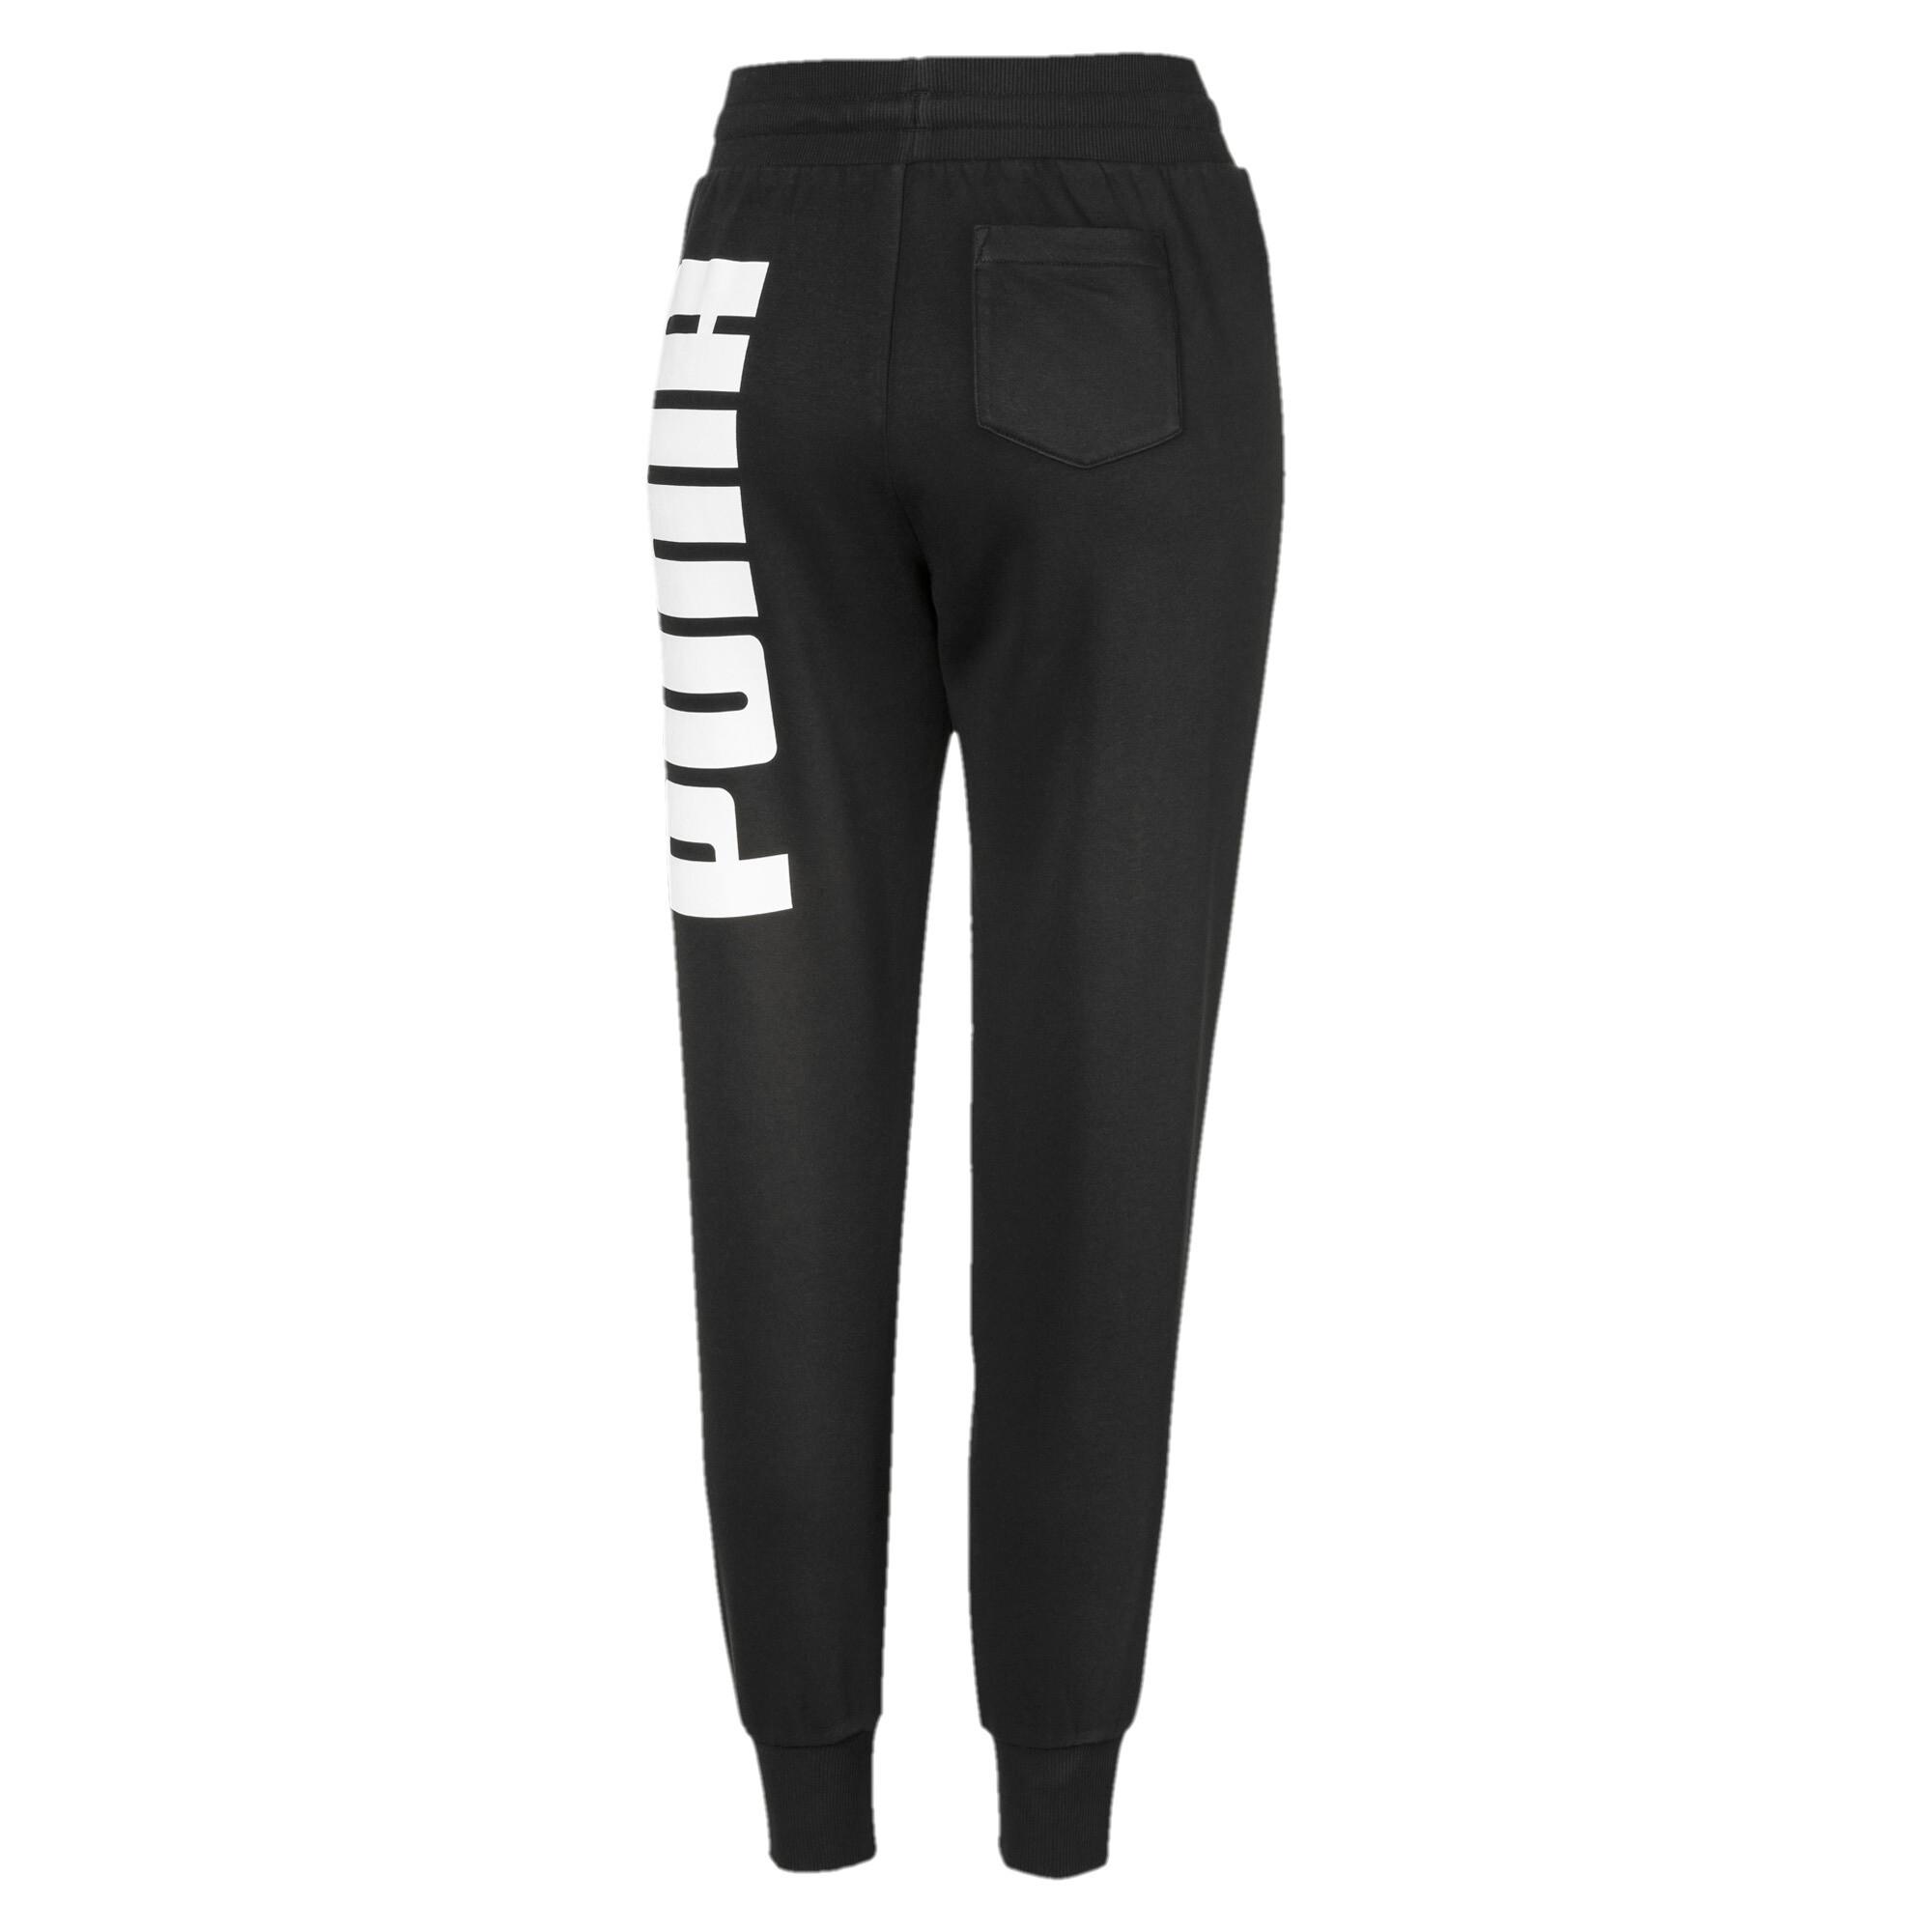 PUMA-Rebel-Women-039-s-Sweatpants-Women-Knitted-Pants-Basics thumbnail 3